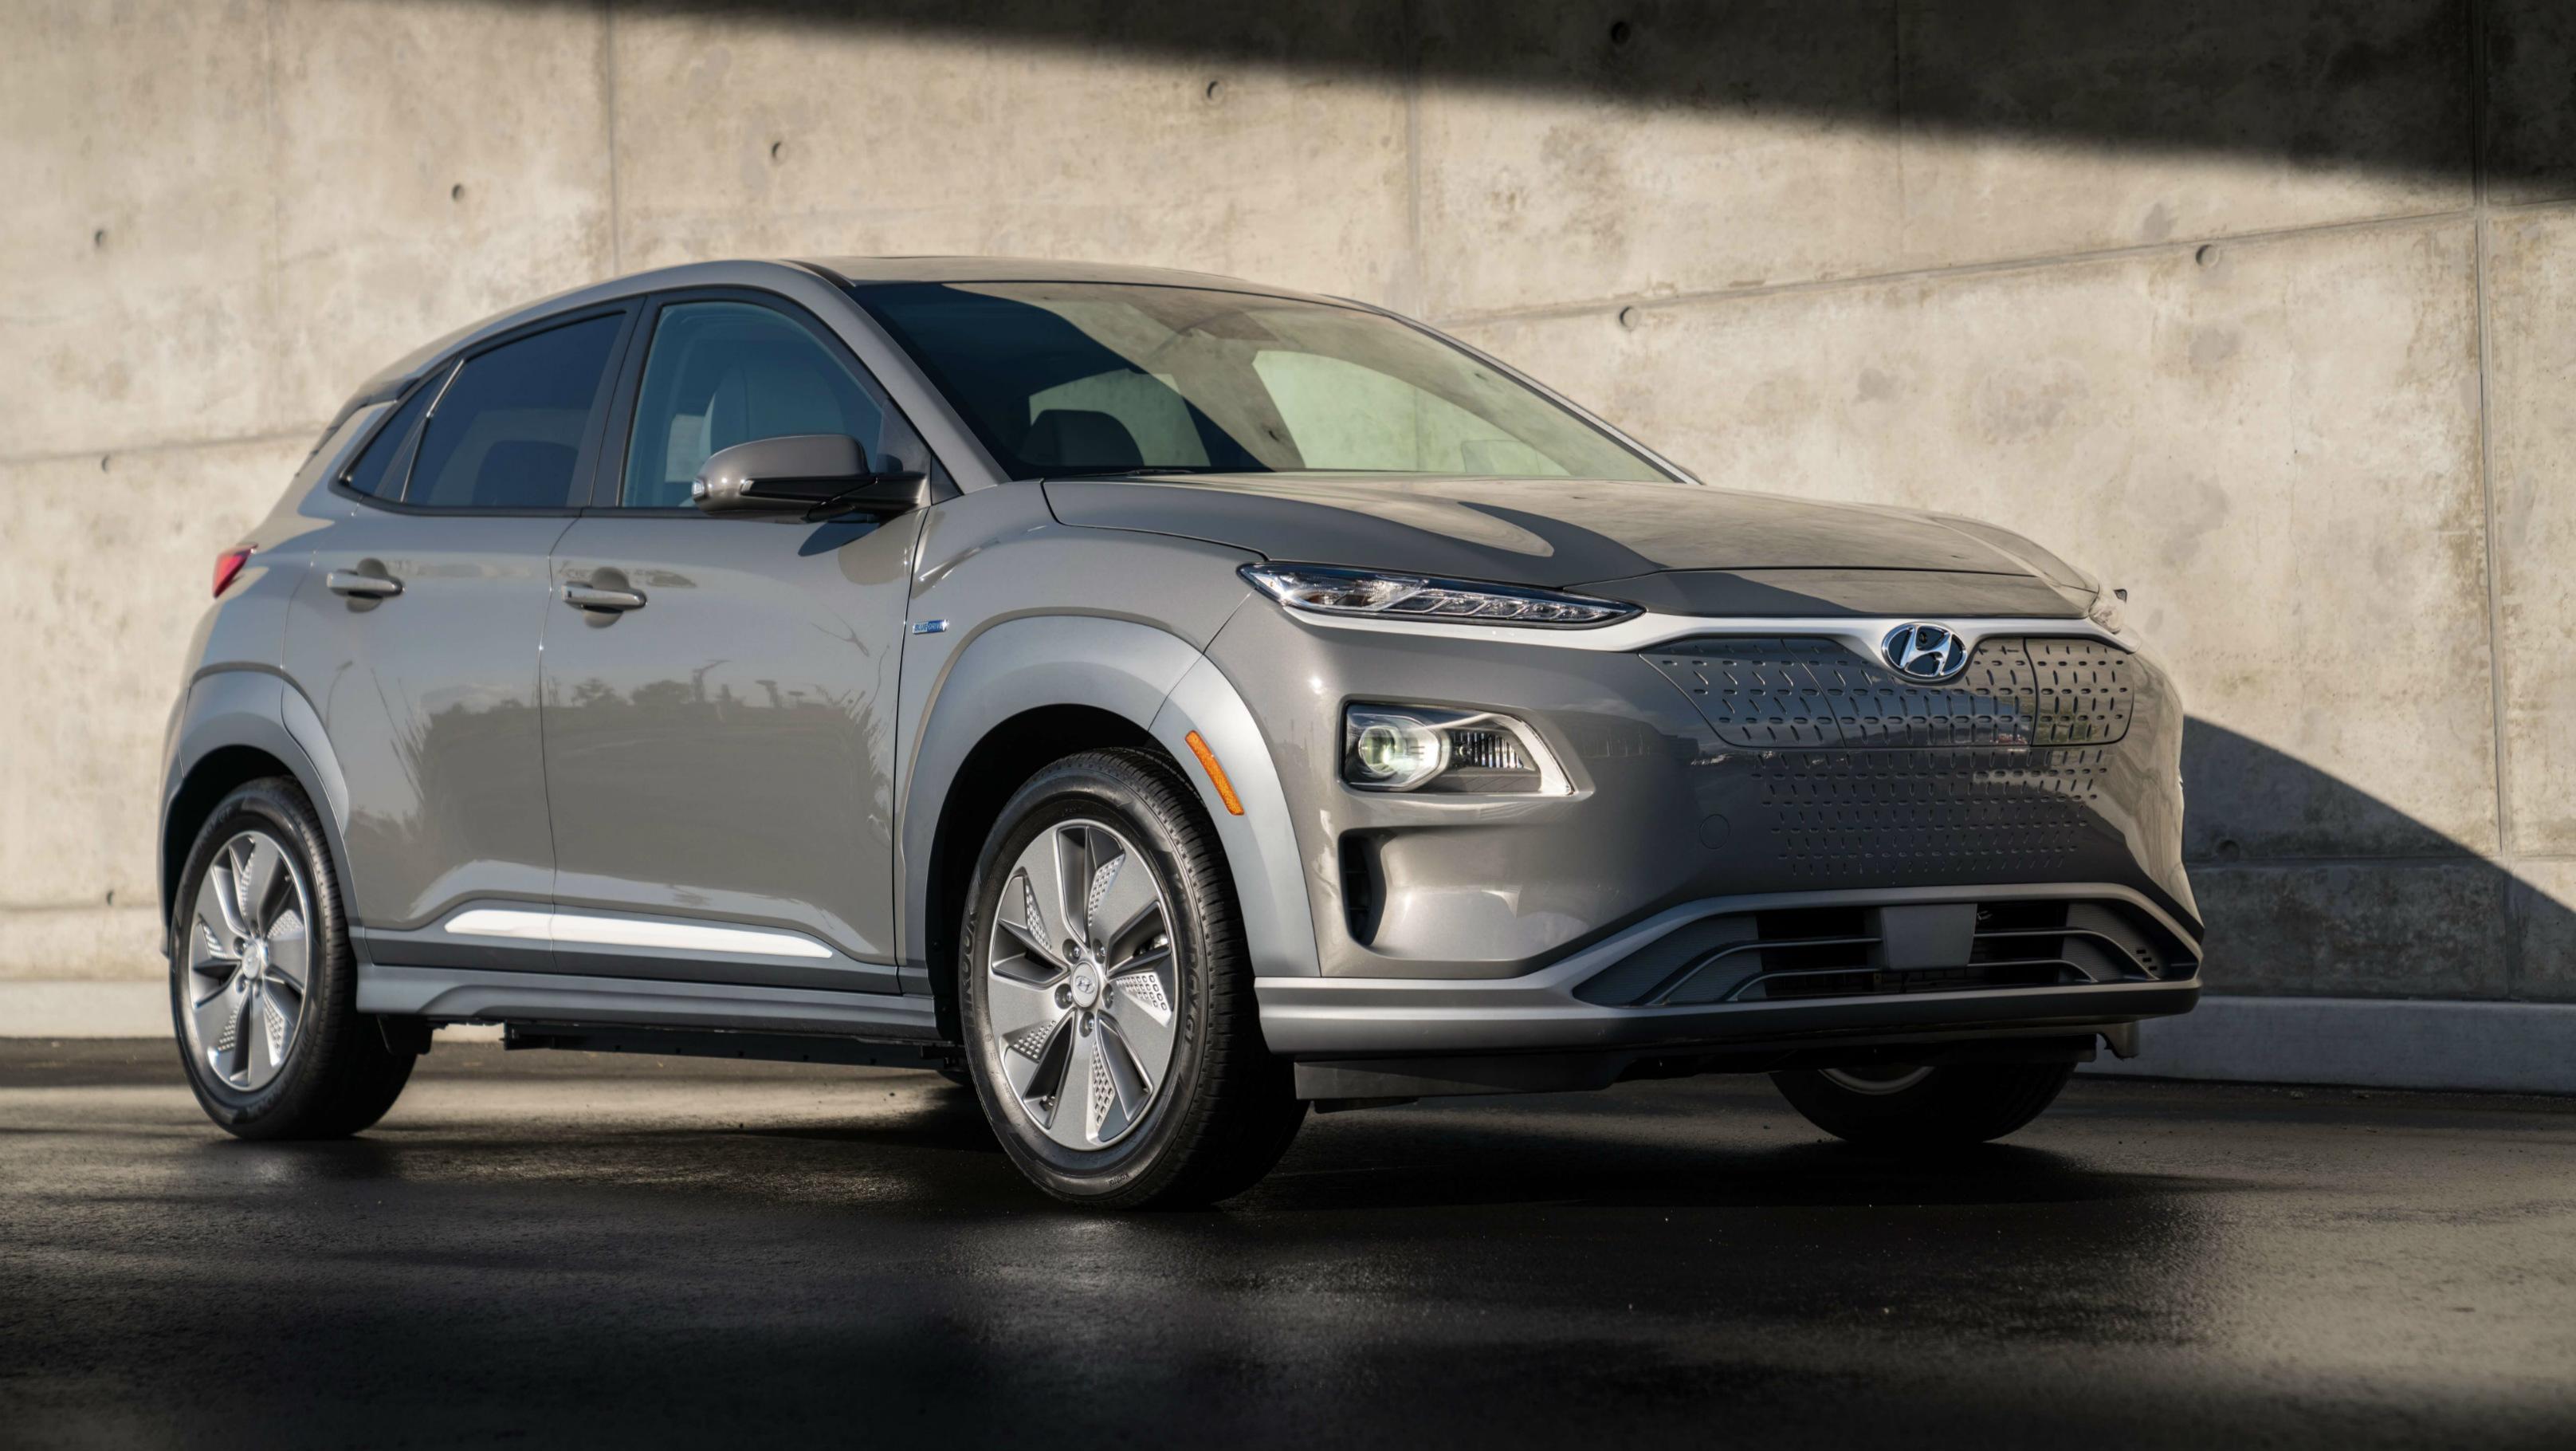 Hyundai kona electric car price